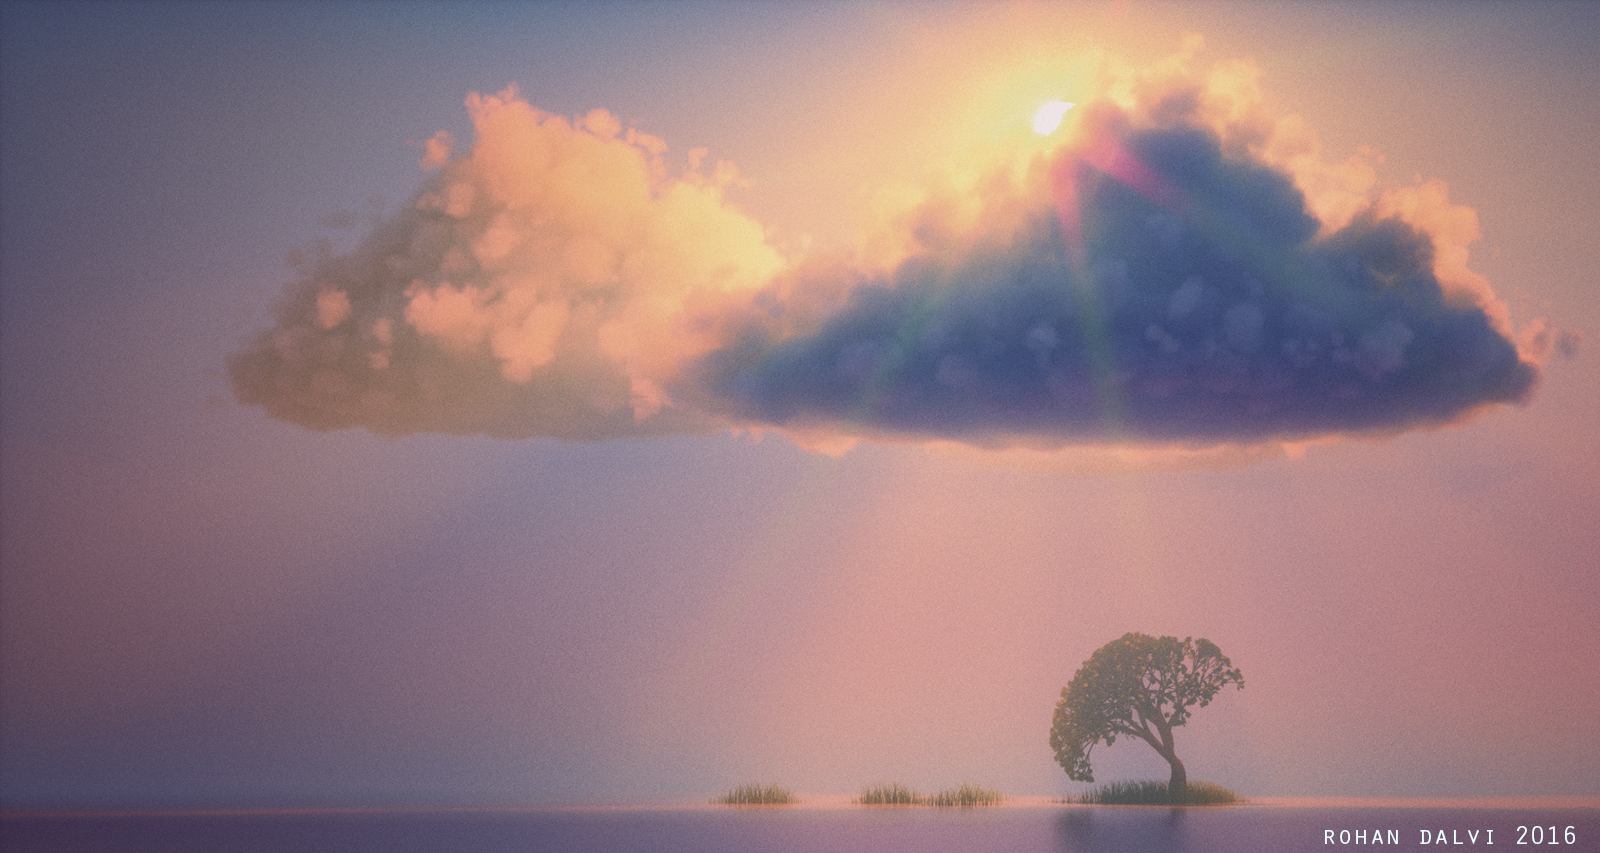 clouds_1600.jpg?format=2500w